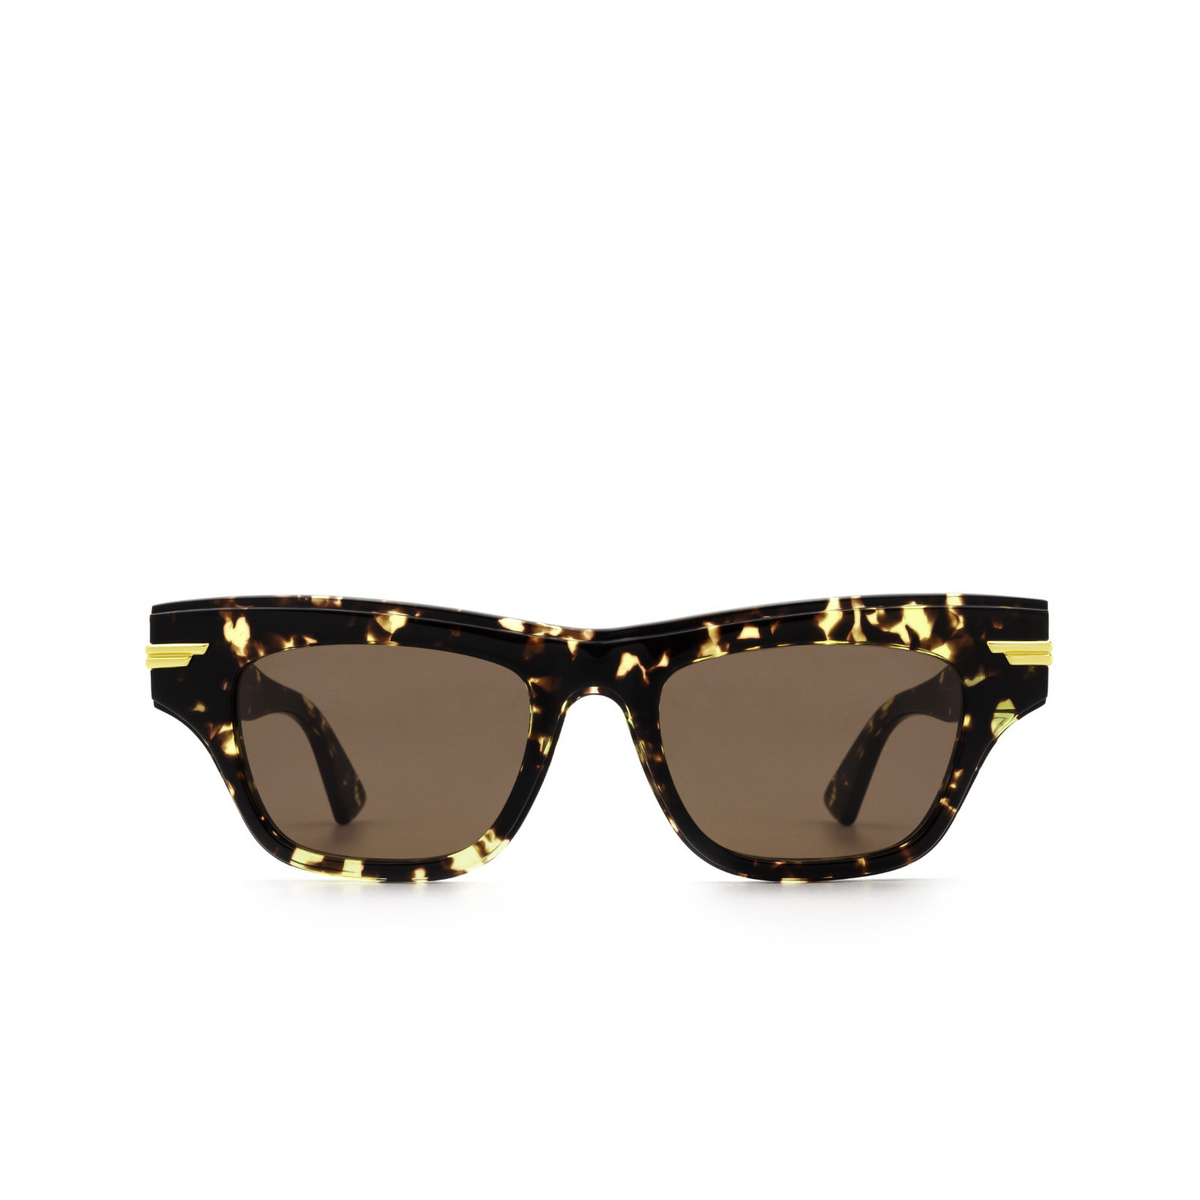 Bottega Veneta® Cat-eye Sunglasses: BV1122S color Havana 002 - front view.